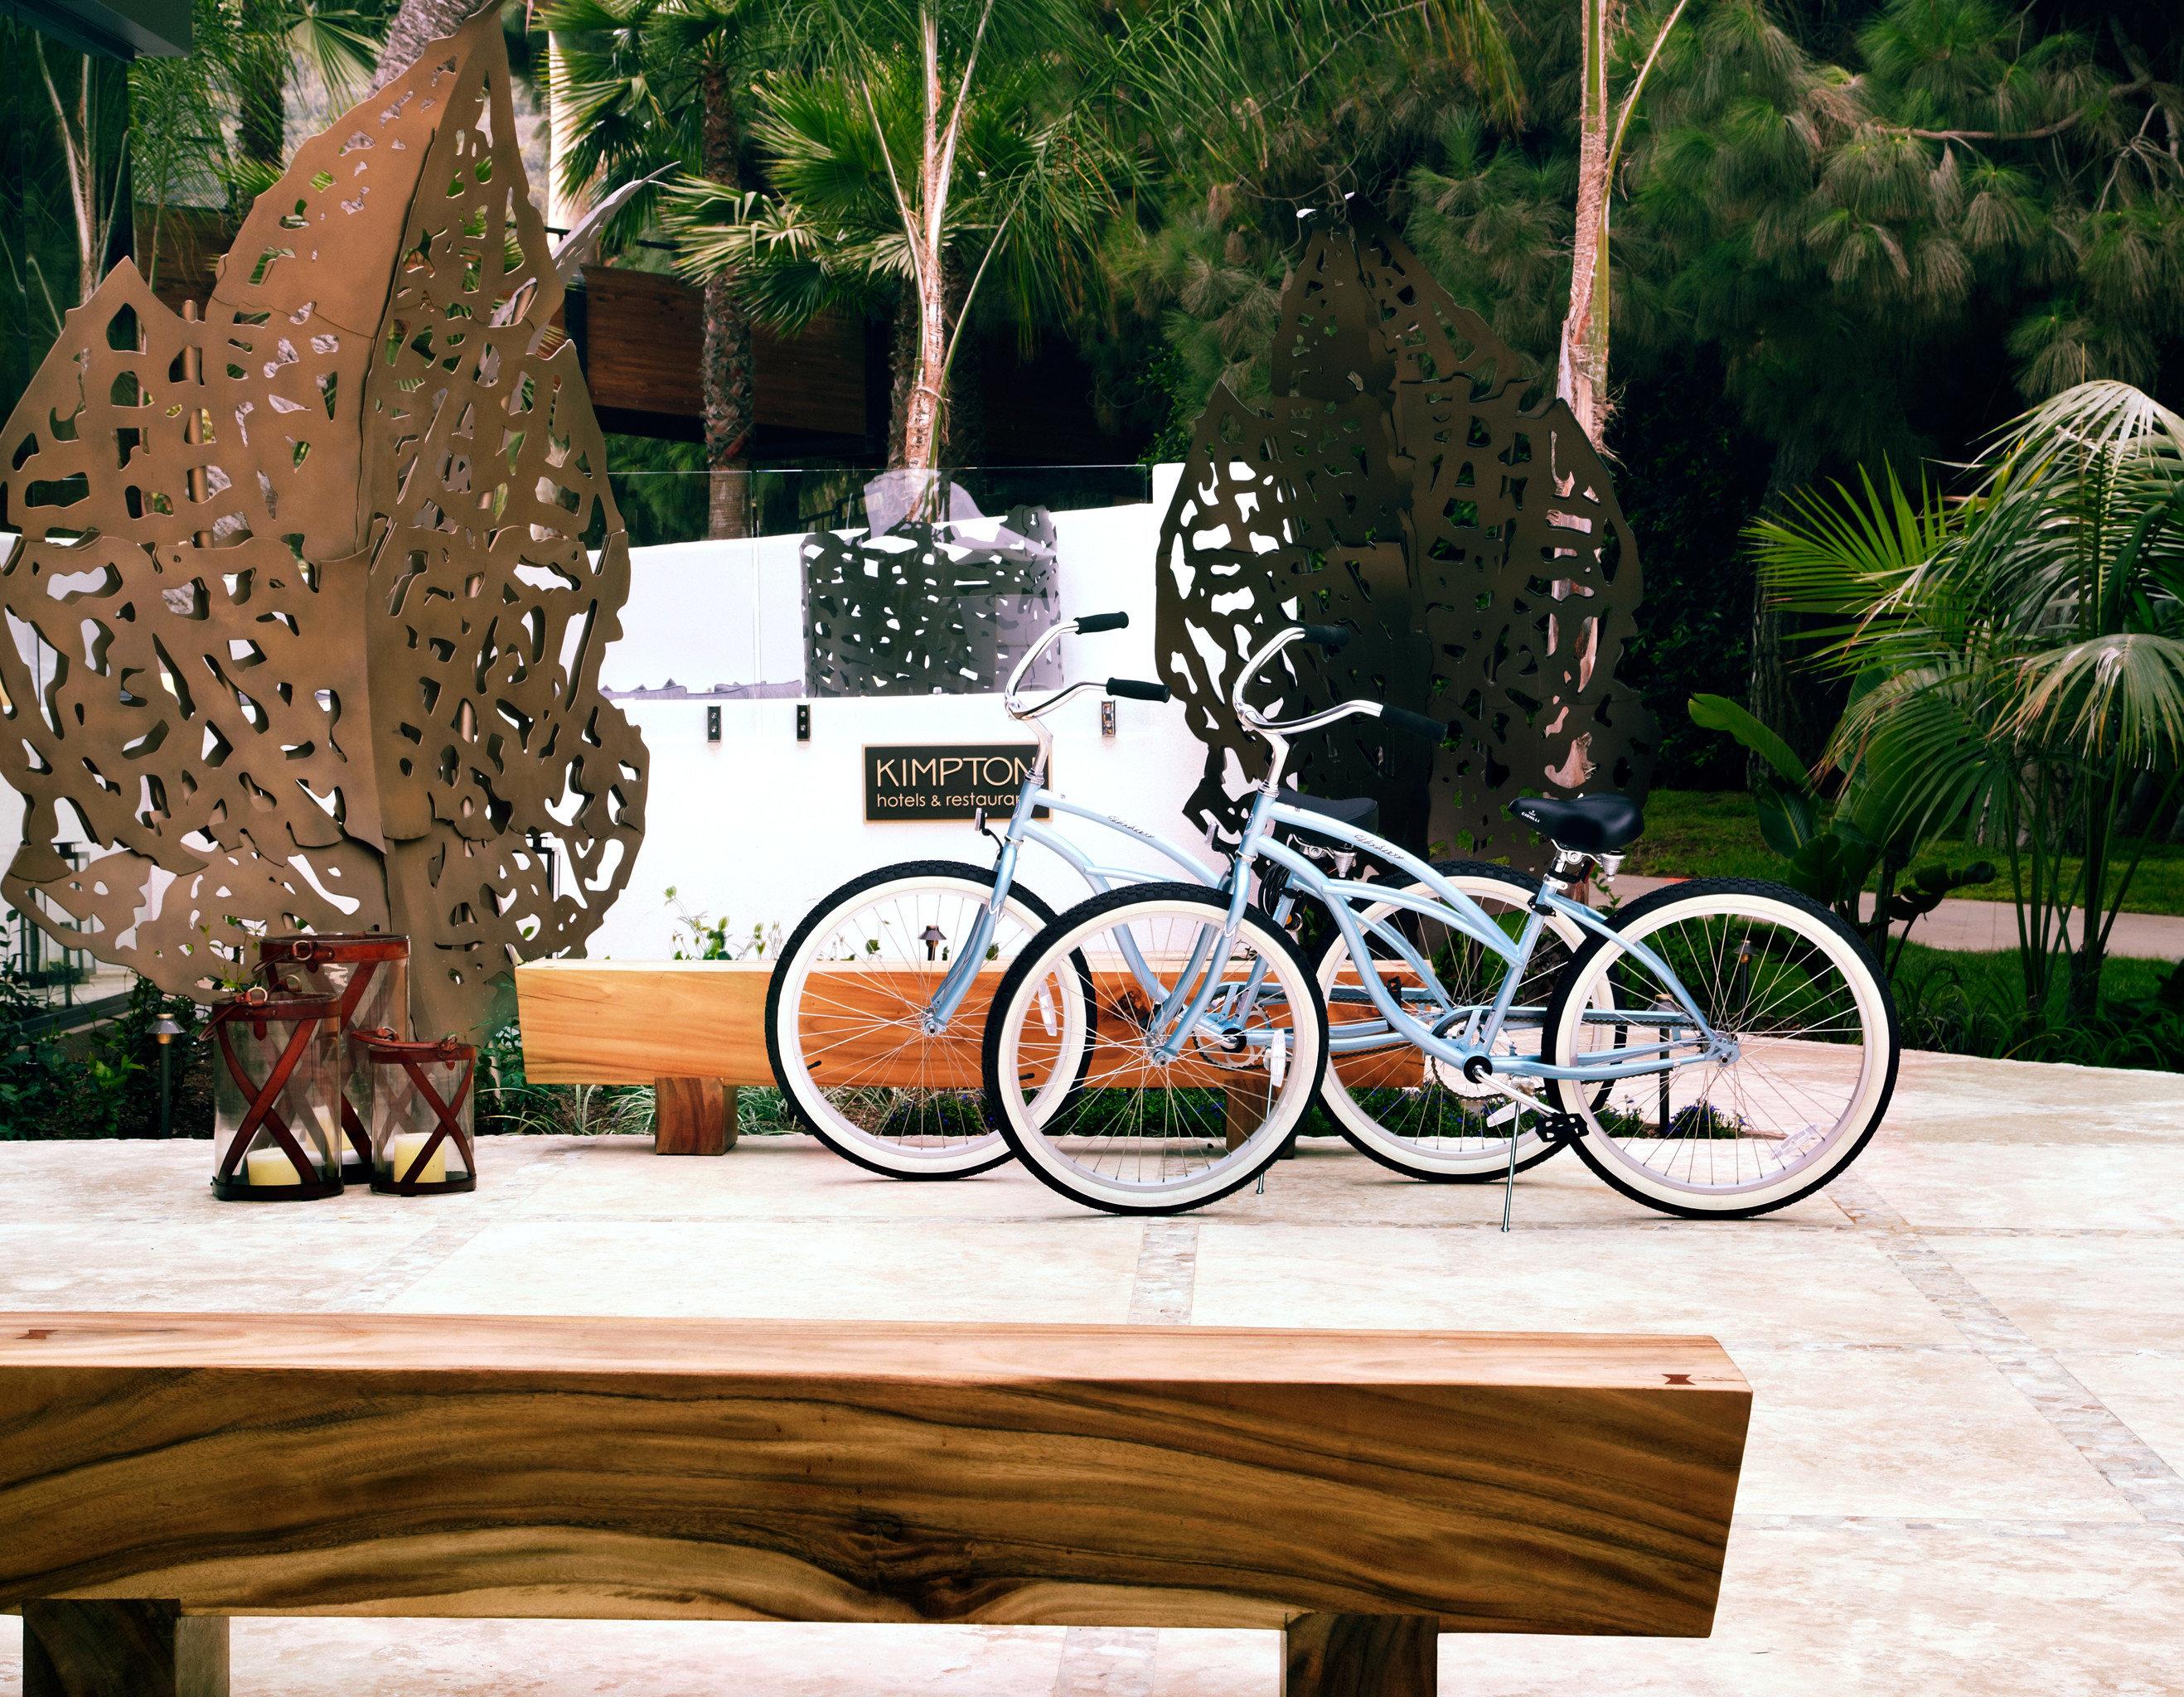 Grounds Hip Hotels Outdoors Sport Wellness tree ground vehicle art home